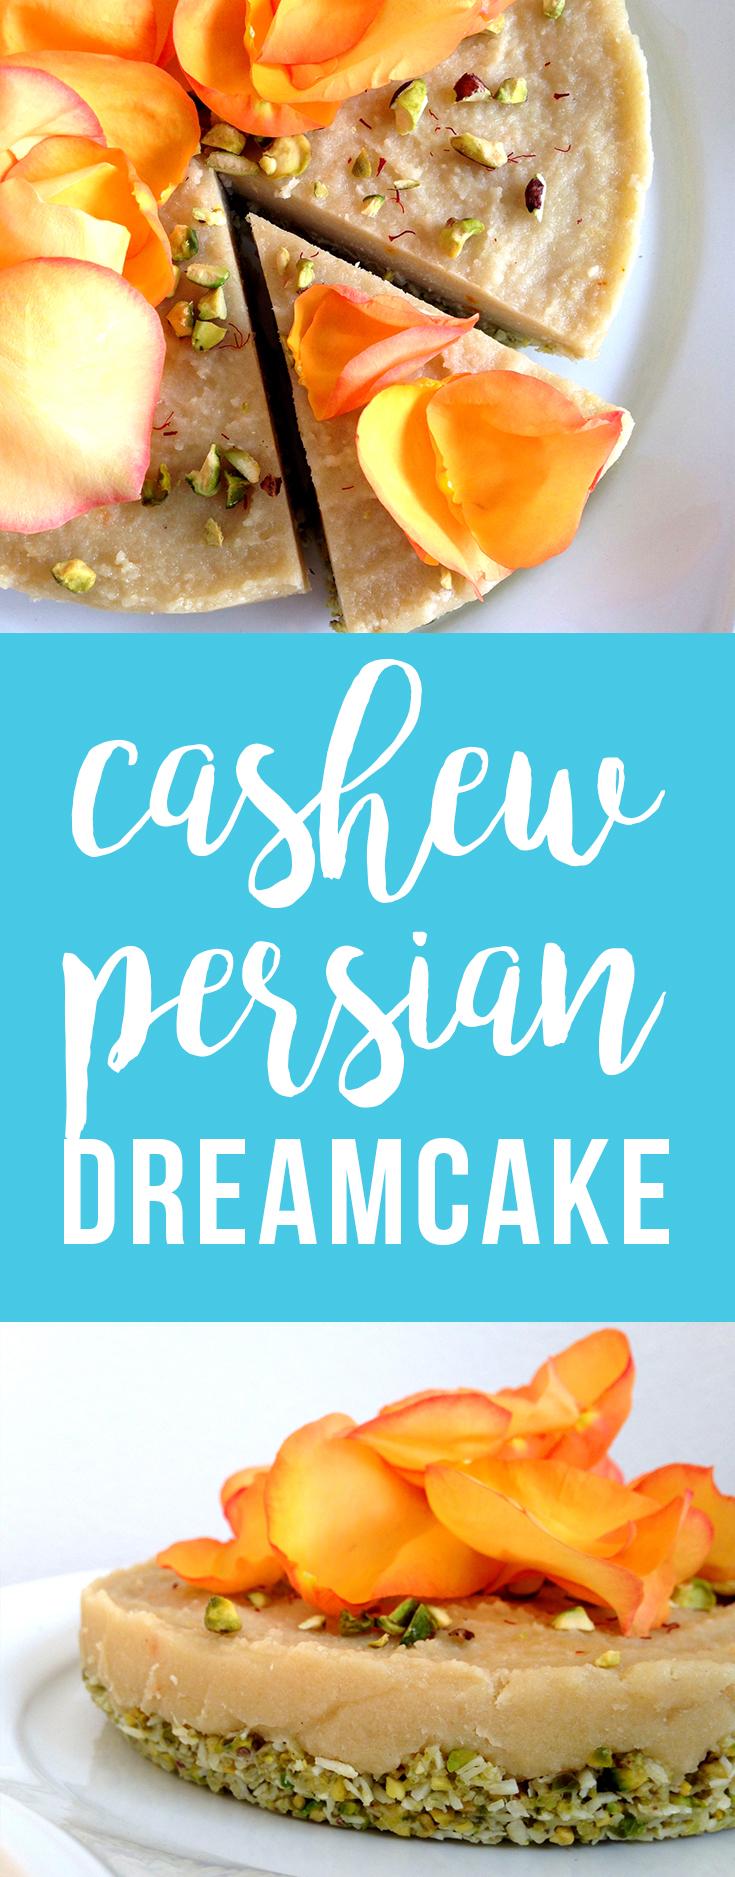 Raw Cashew Persian Dreamcake (vegan & paleo)